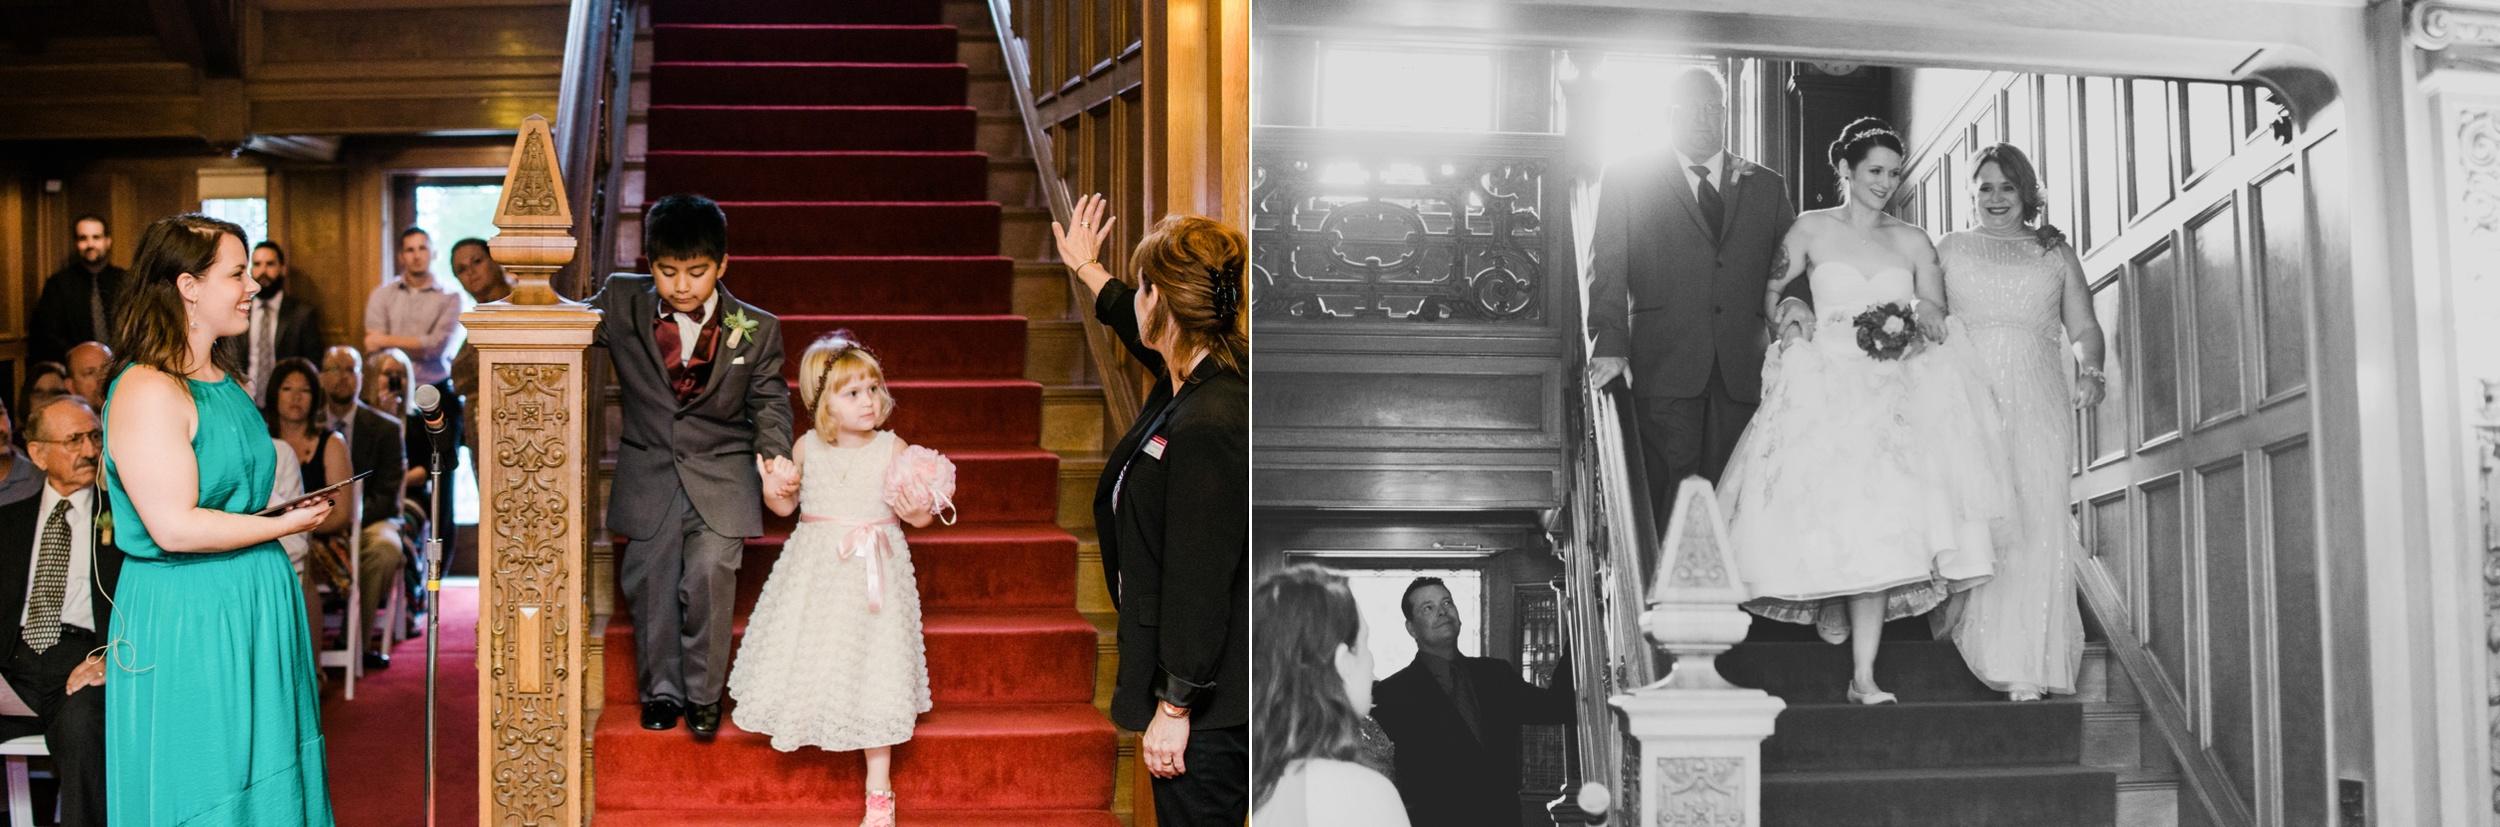 Glensheen Mansion Wedding | Duluth, MN Wedding Photographer_0508.jpg